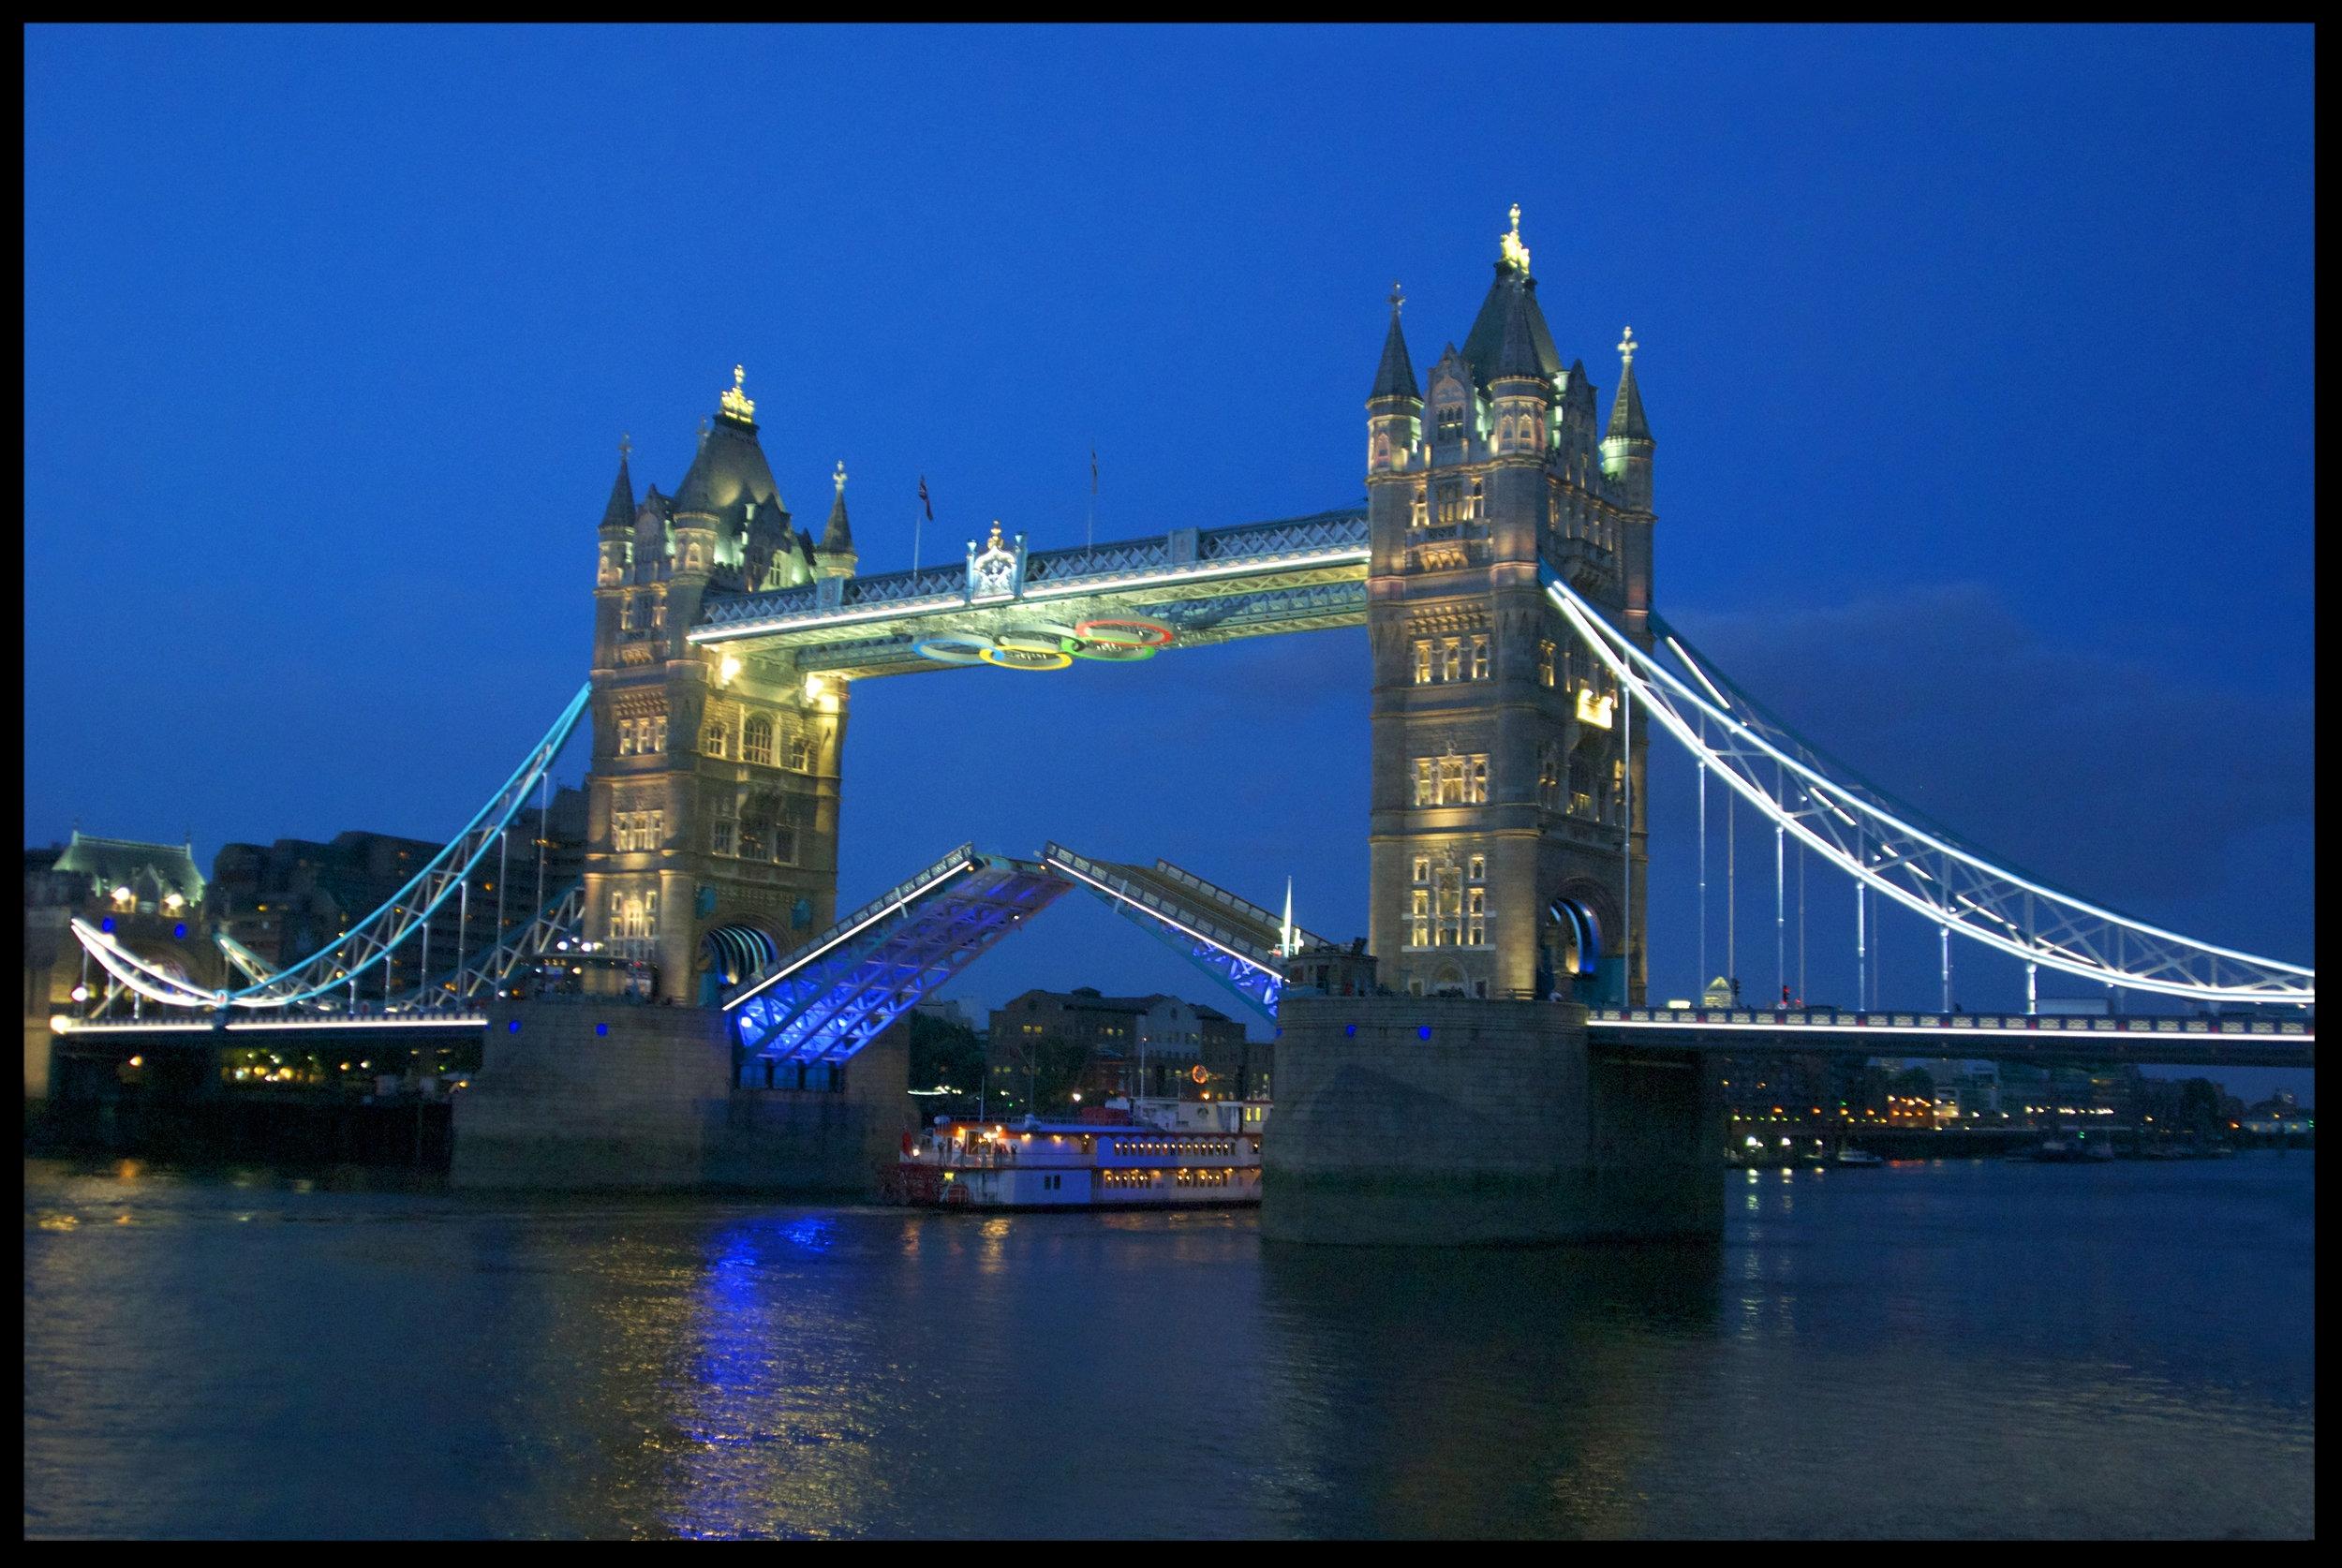 LondonBridgeOlympic.jpg